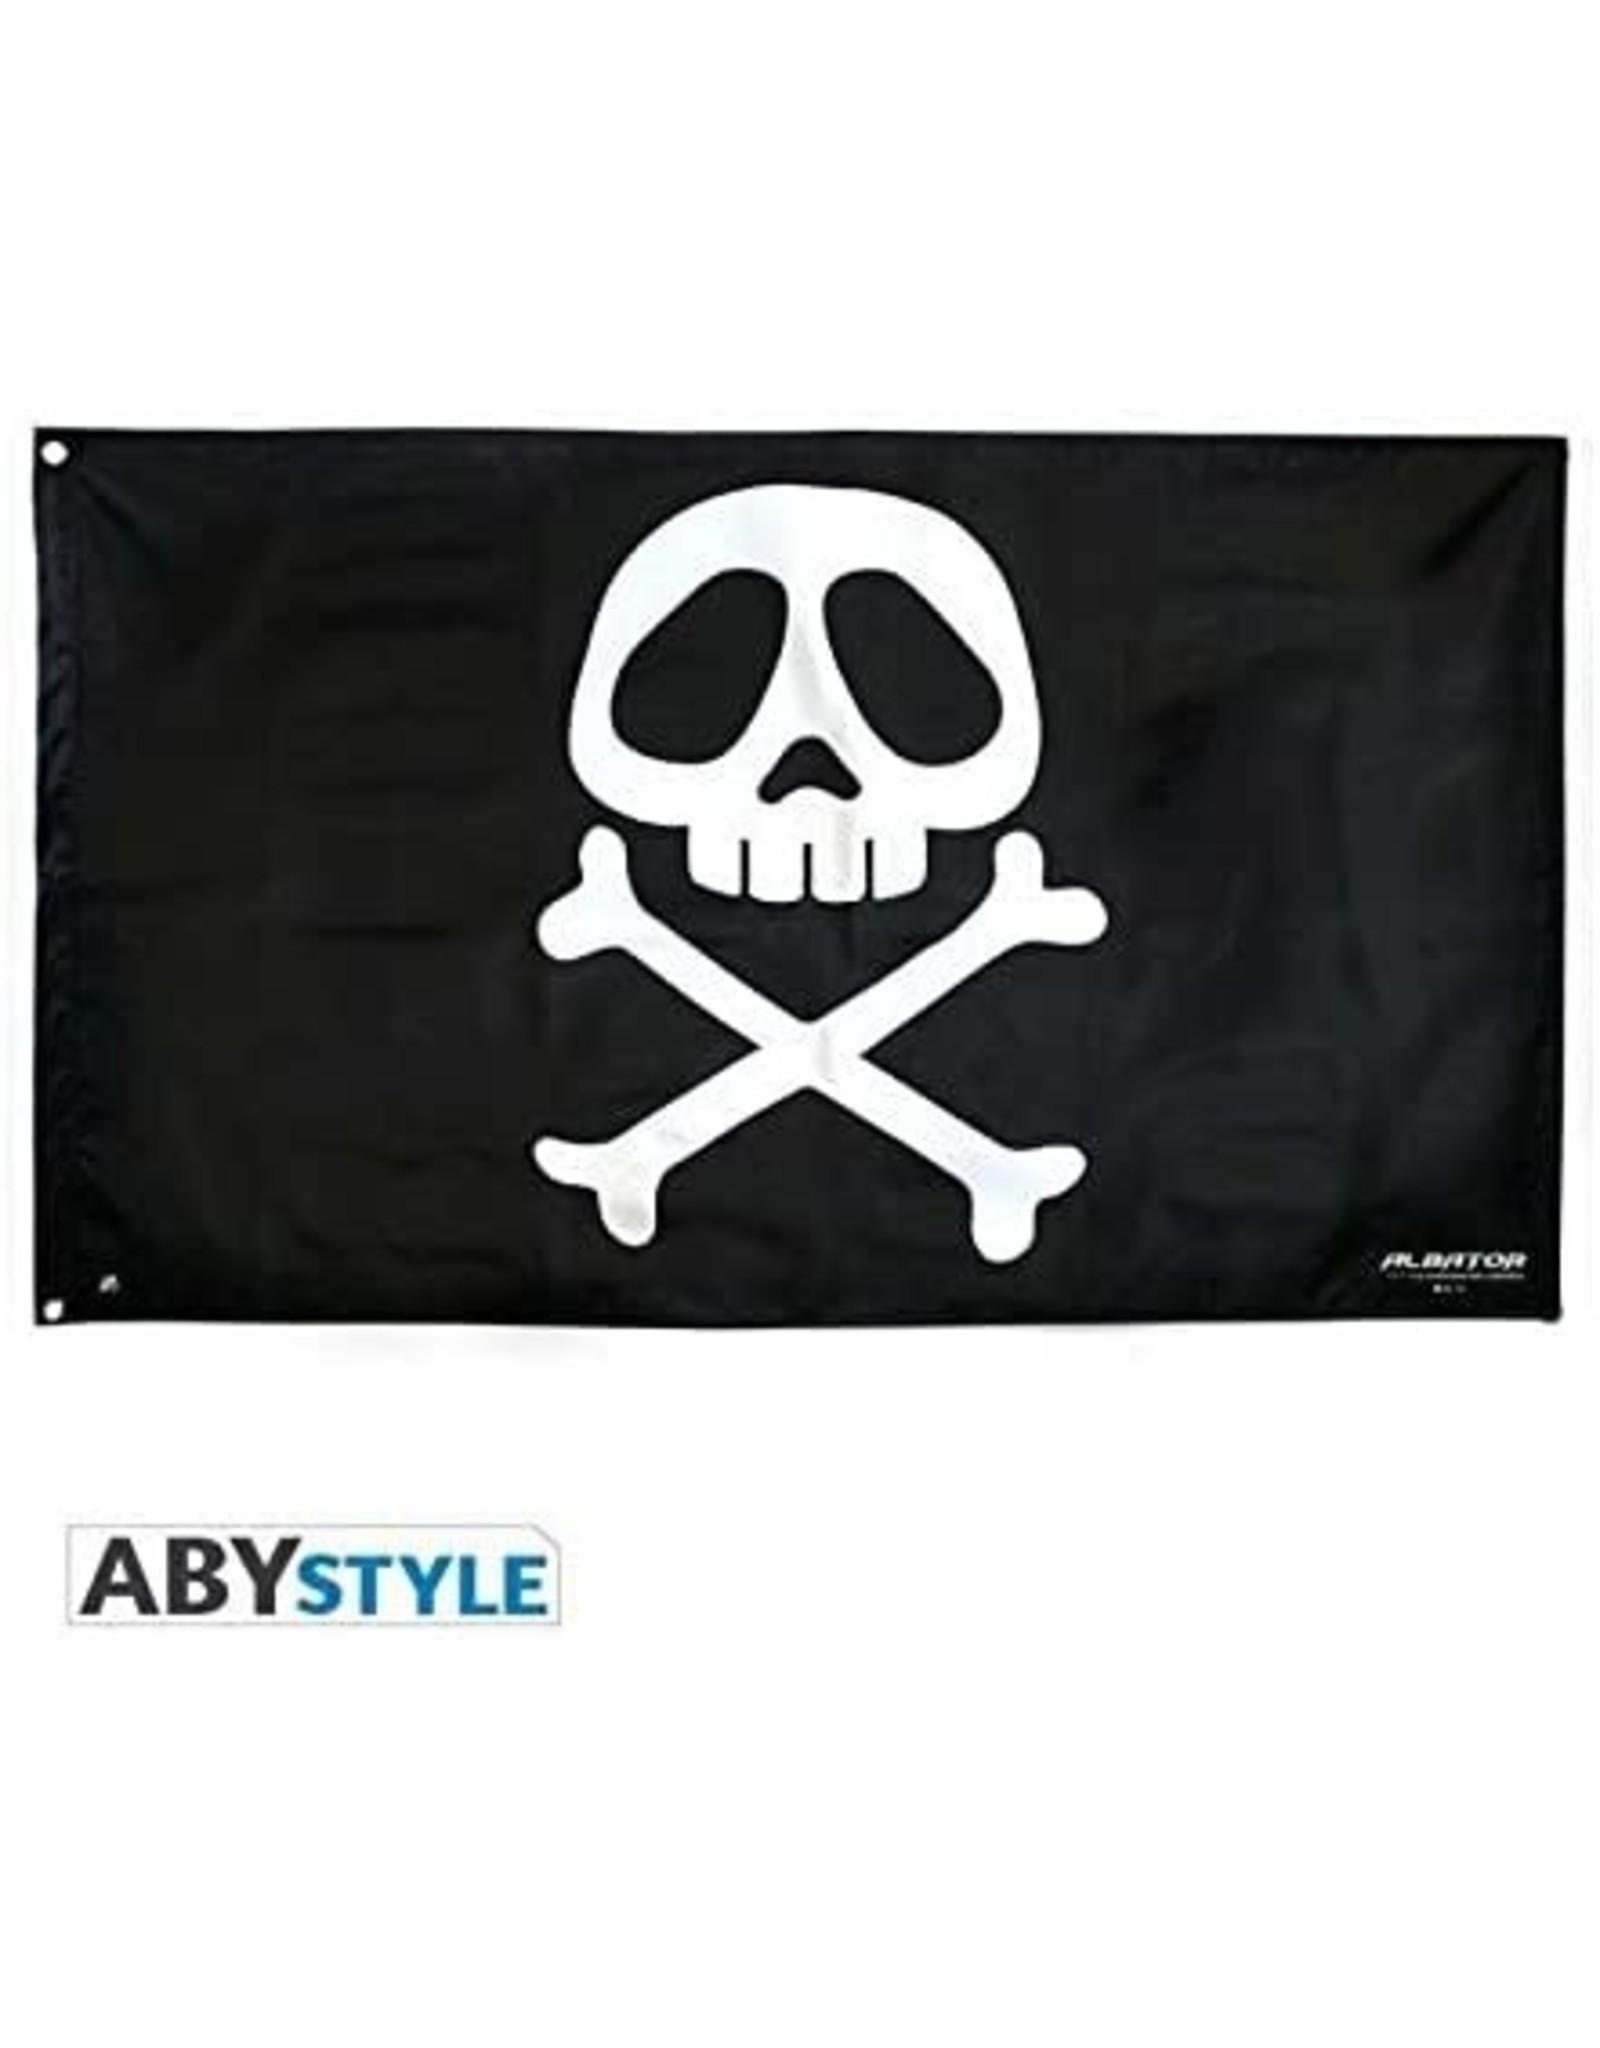 ABYstyle ALBATOR Flag 70X120cm - Emblem